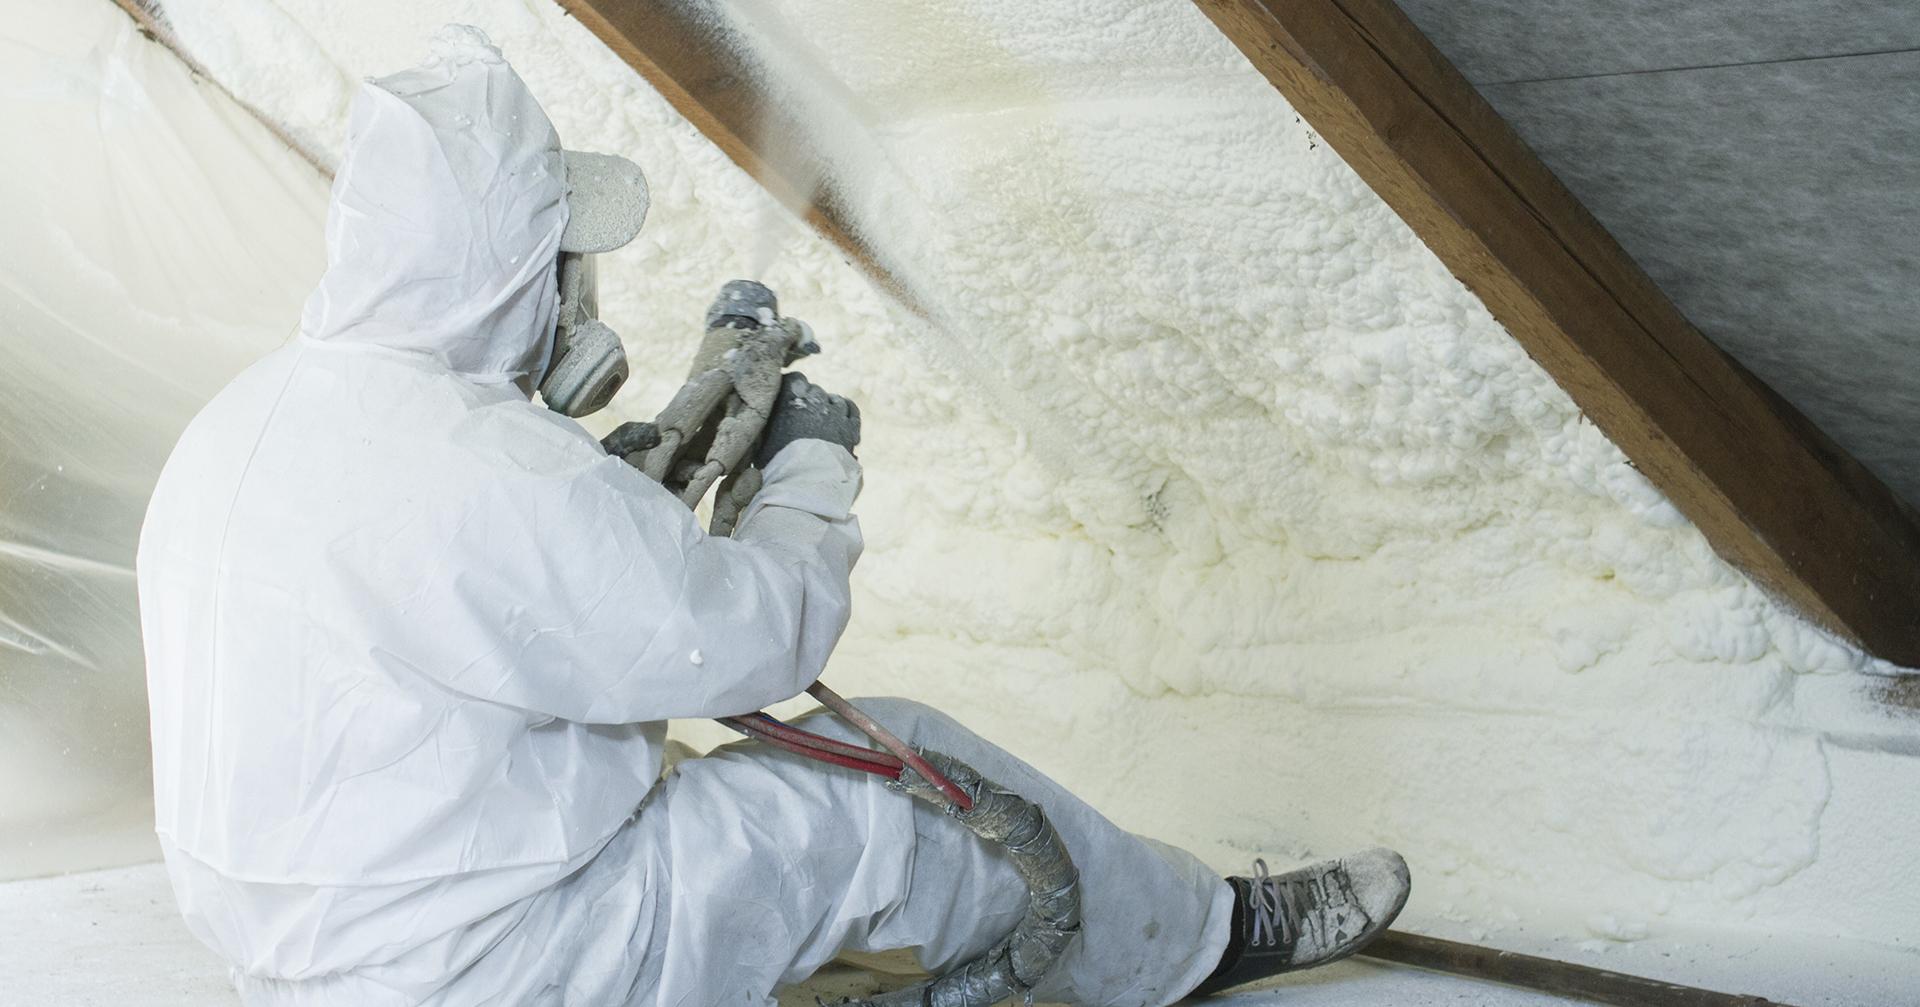 Guy on the attic